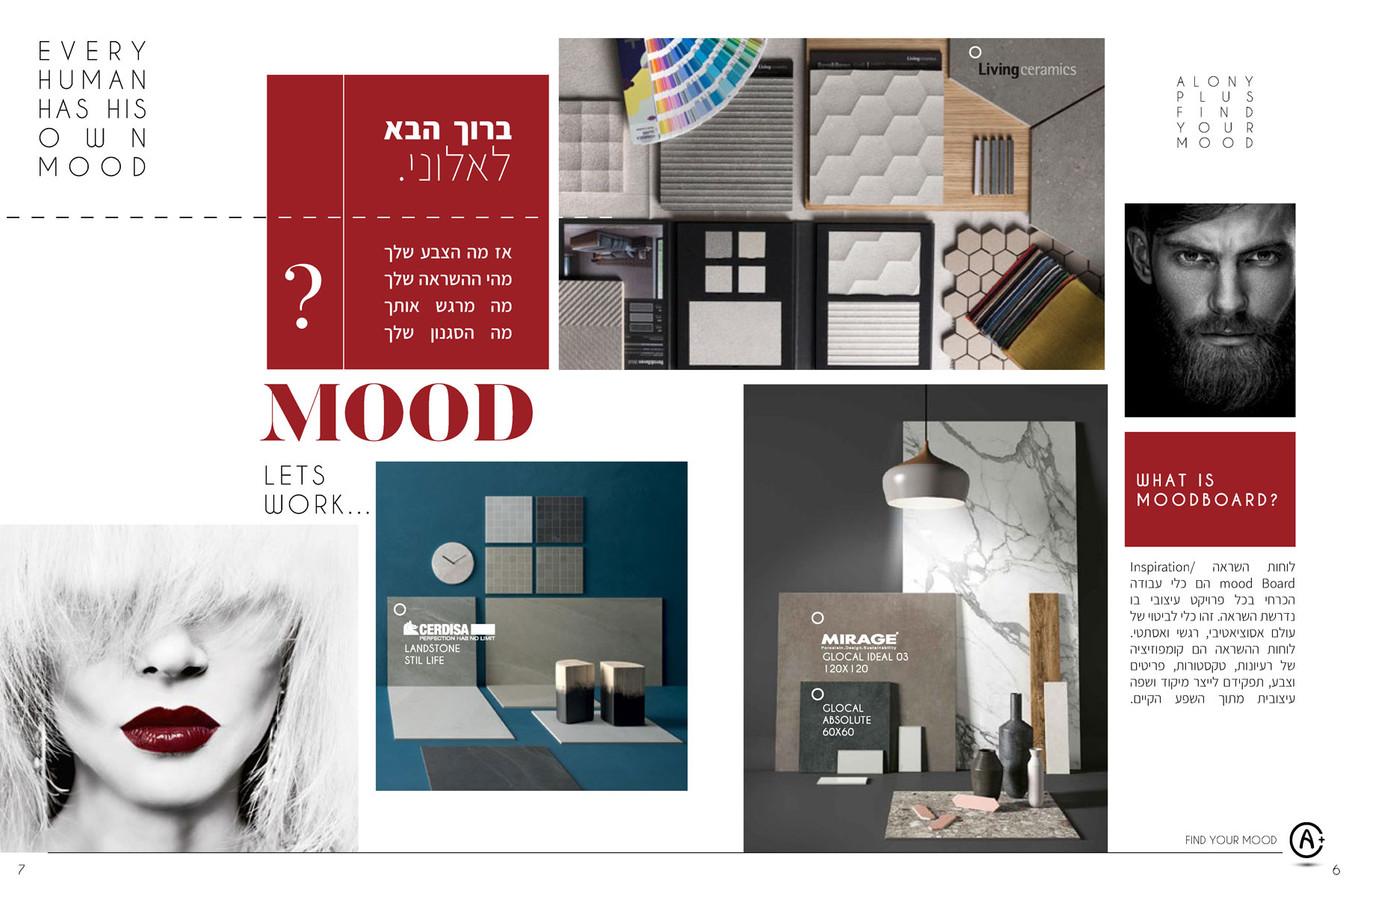 מגזין-אלוני-web-FULL-2018_Page_04.jpg